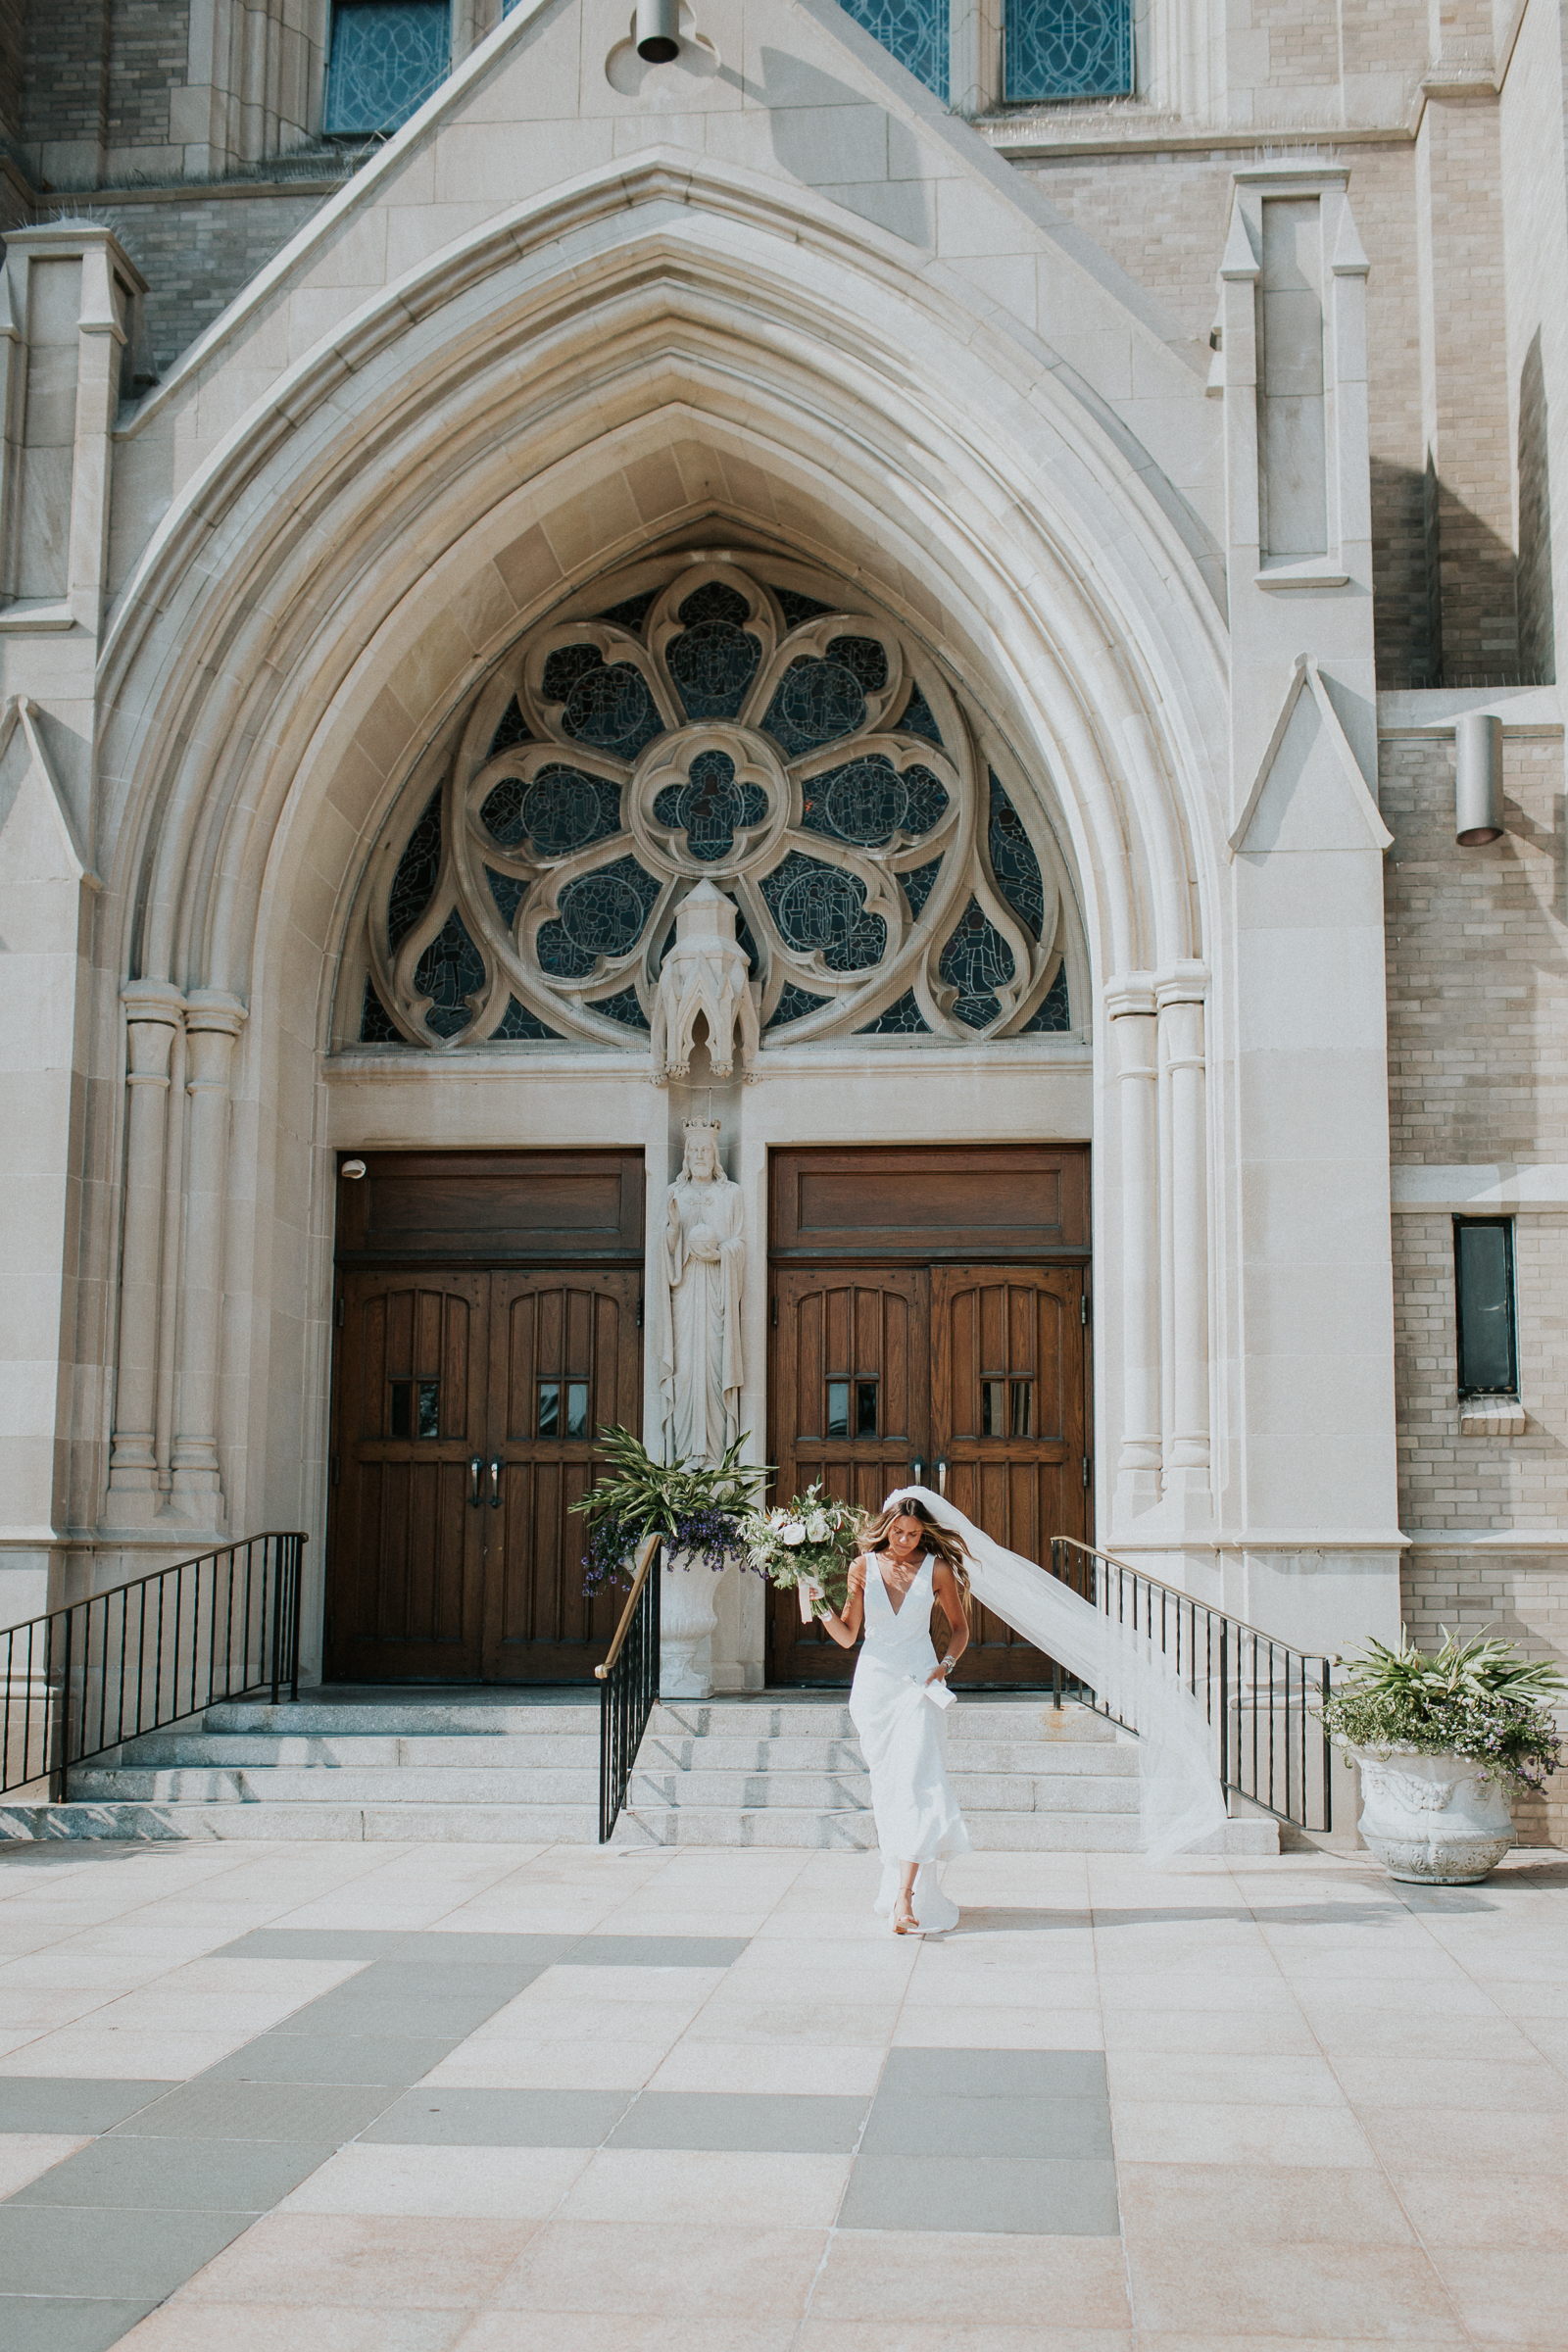 New-York-Documentary-Wedding-Photography-Best-Of-2017-by-Elvira-Kalviste-Photography-20.jpg